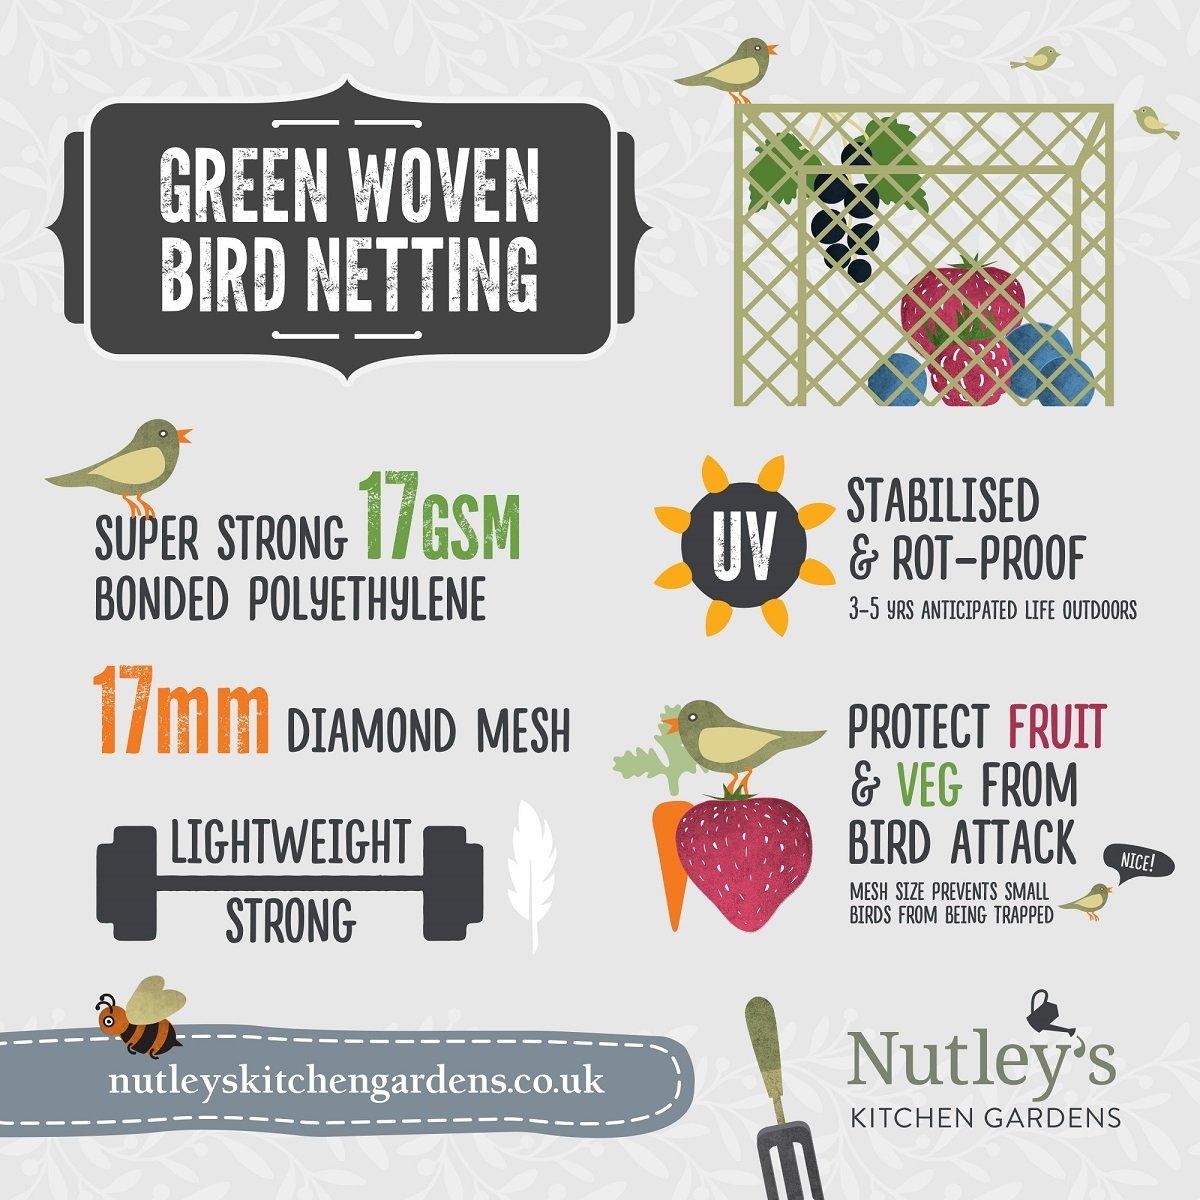 Nutley's 10m x 6m Woven Bird Netting - Green Nutley's FLE08BN10